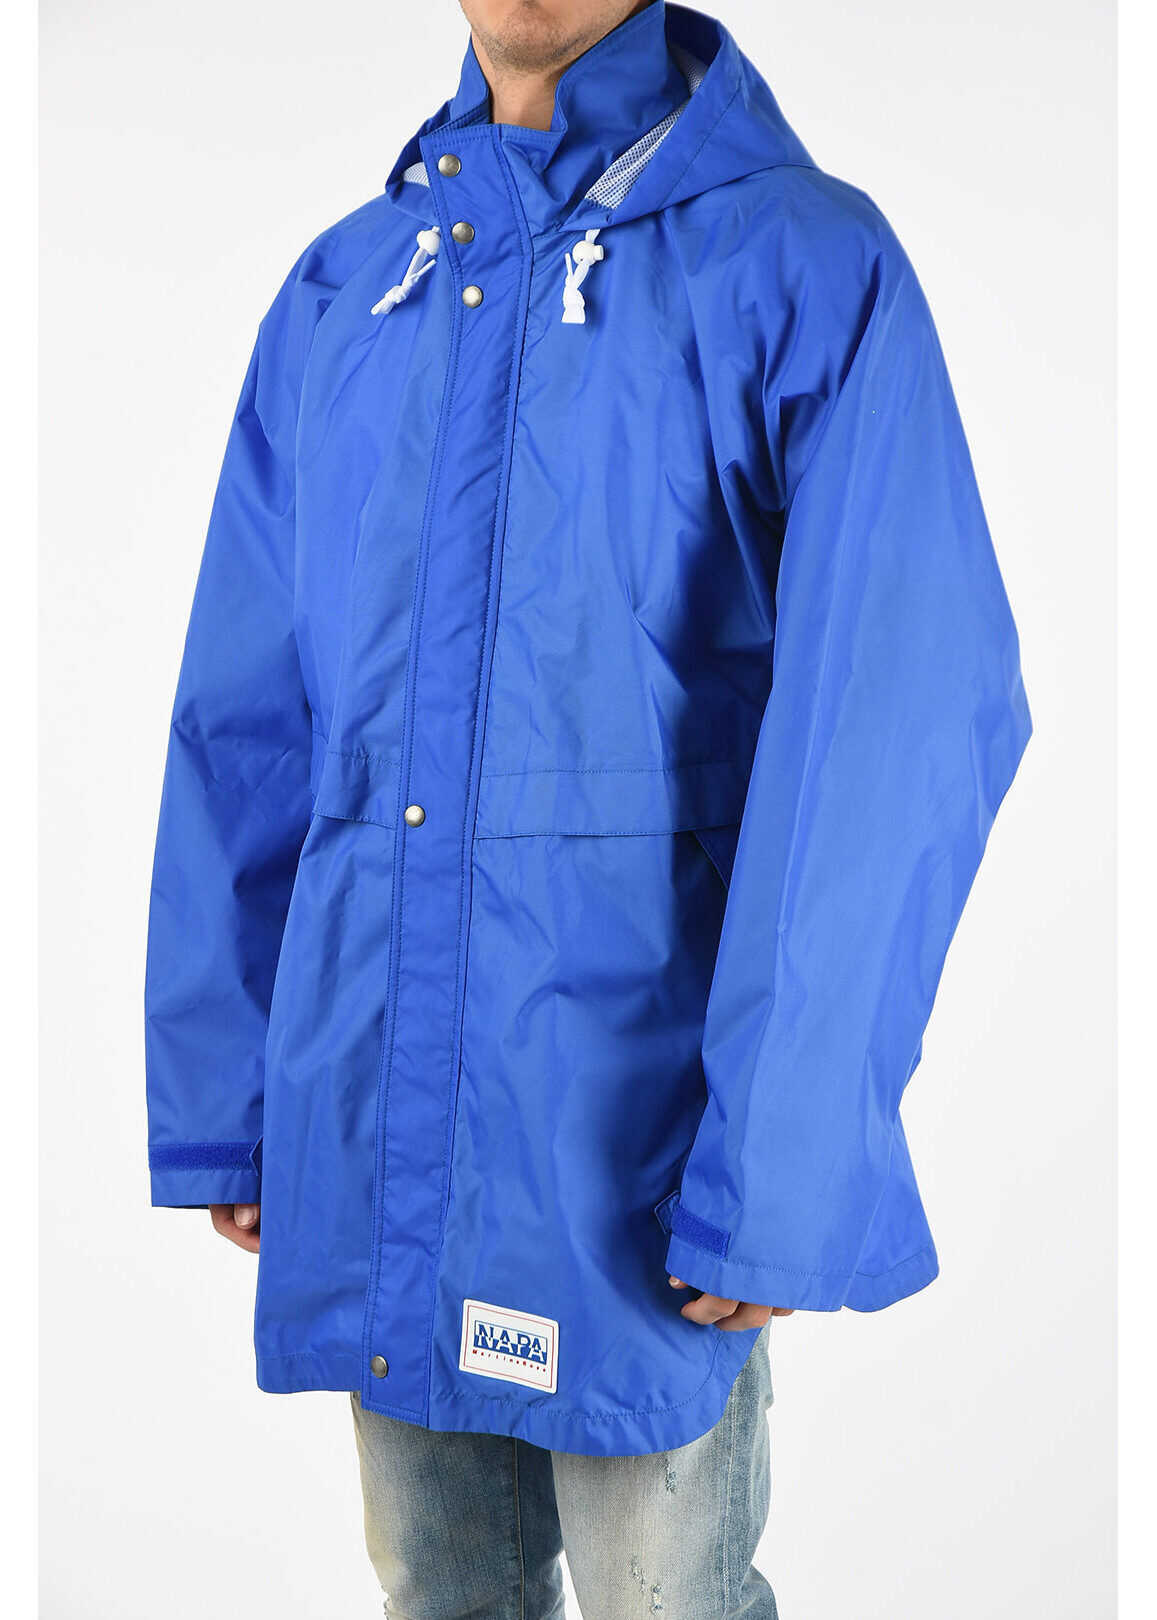 Napapijri MARTINE ROSE Waterproof RAINFOREST OP ALPHA Coat BLUE imagine